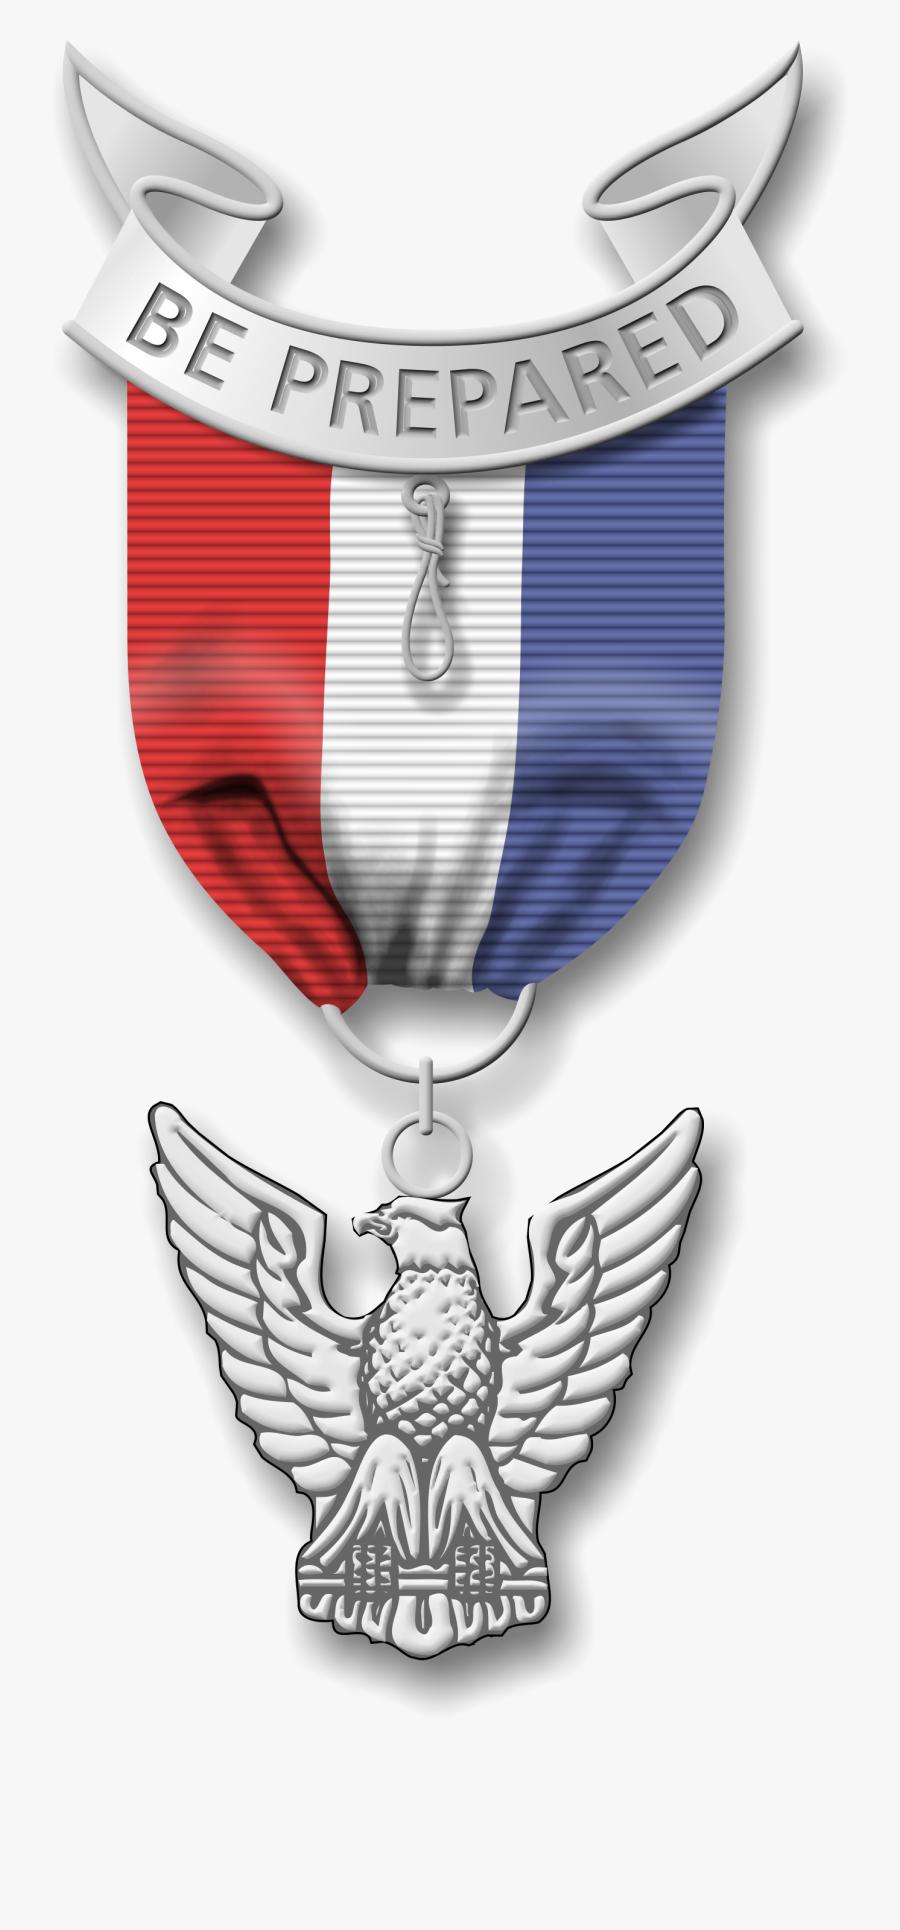 Clip Art Boy Scouts Of America - Eagle Scout Medal Png, Transparent Clipart